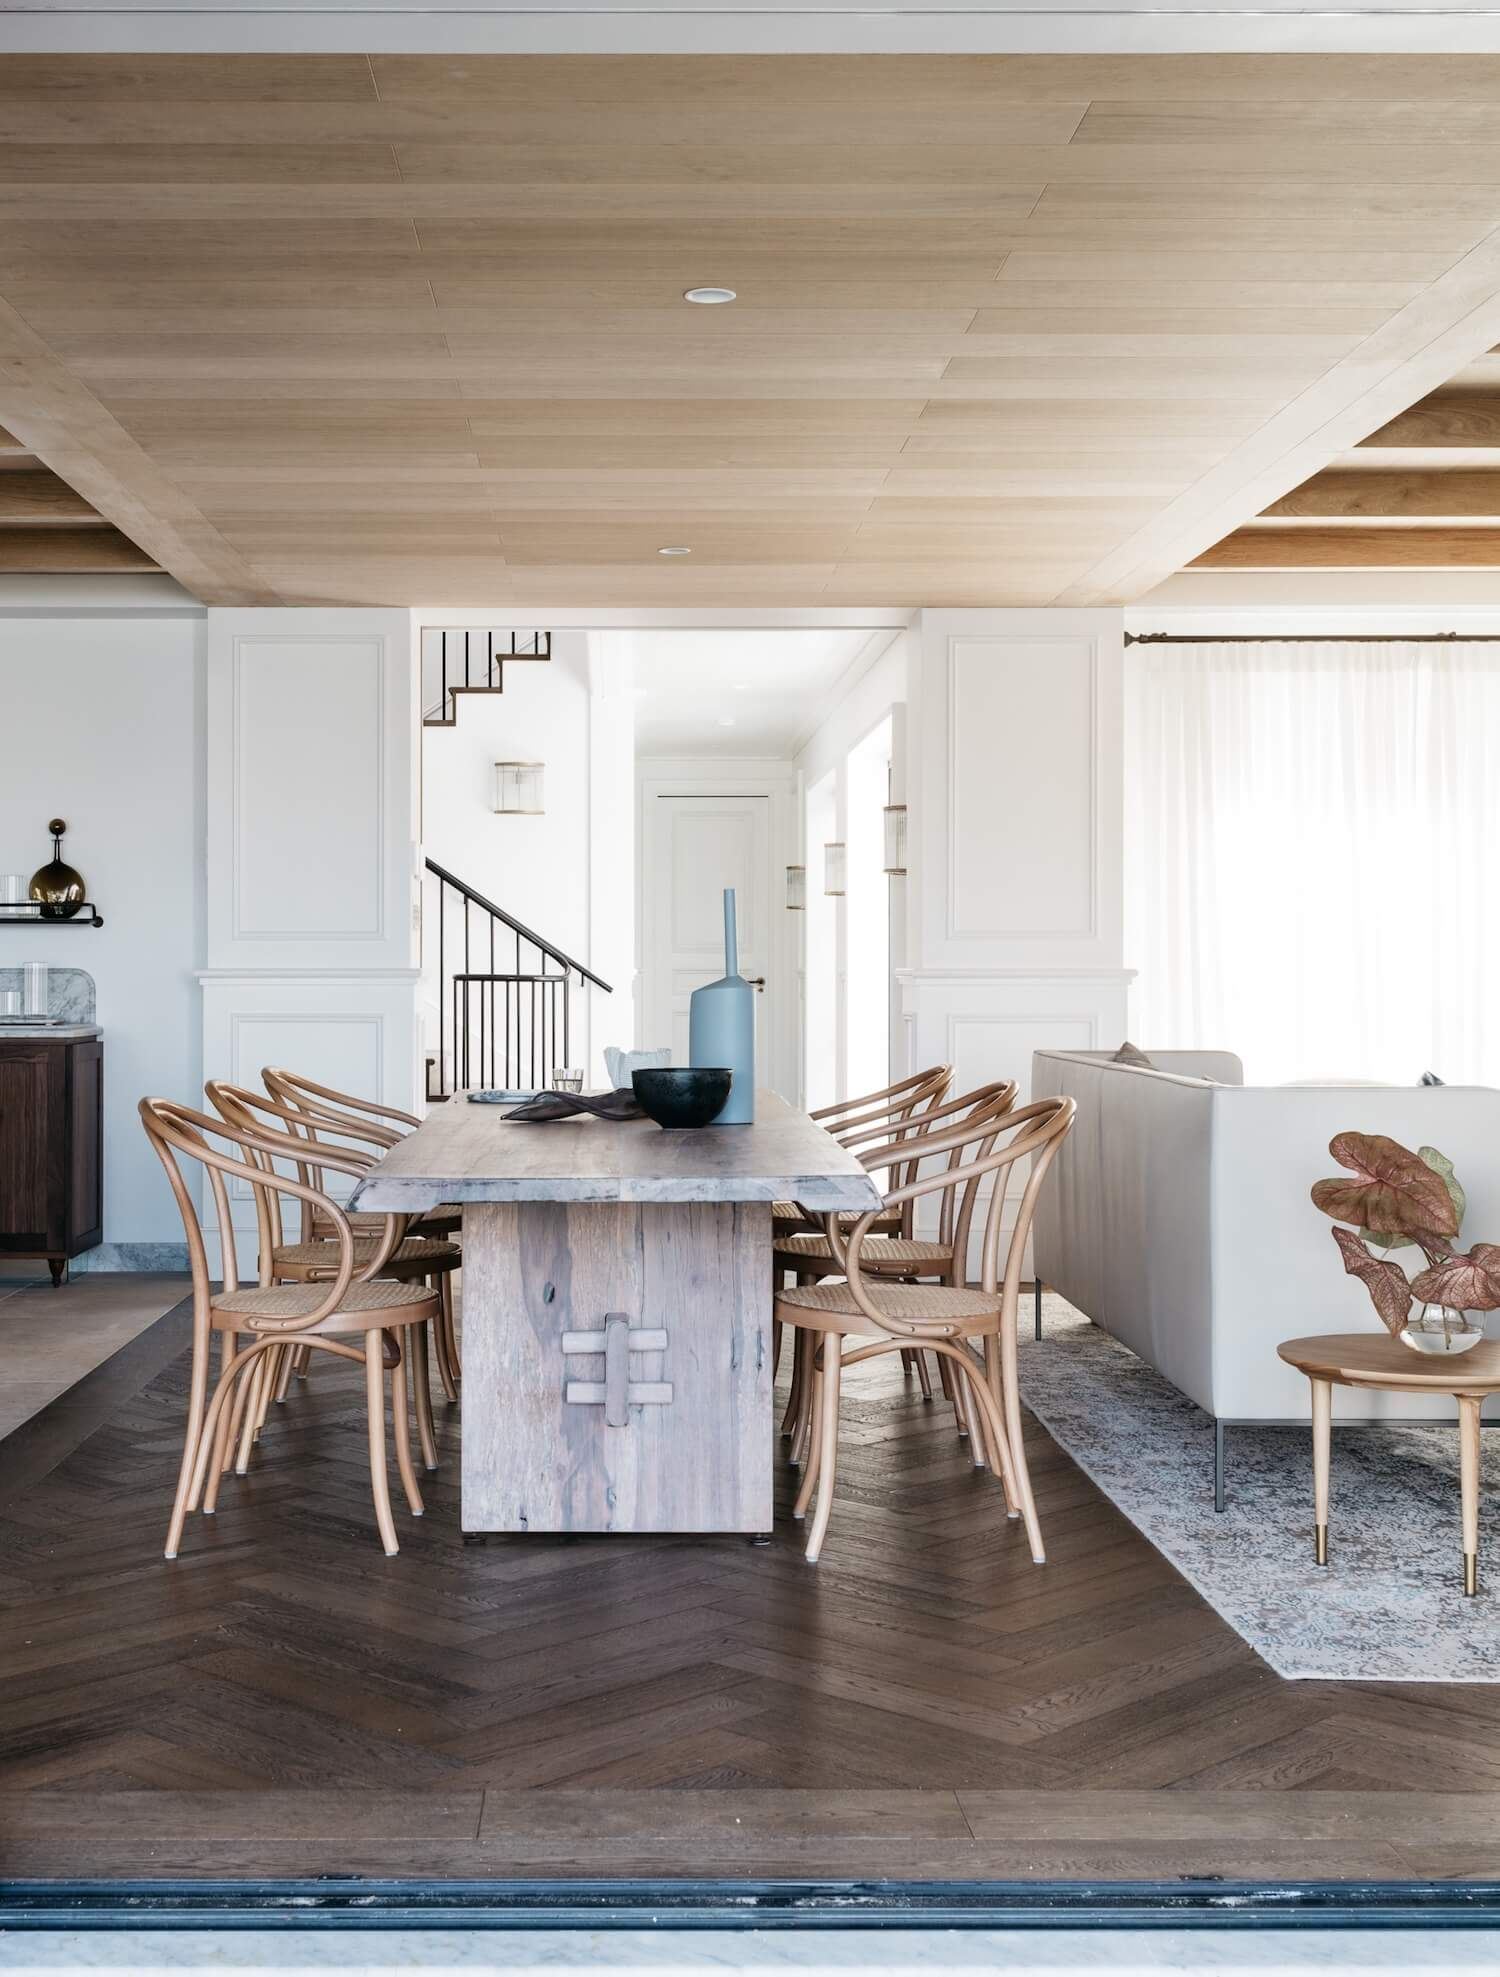 Iluka House Home interior design, Living spaces, House